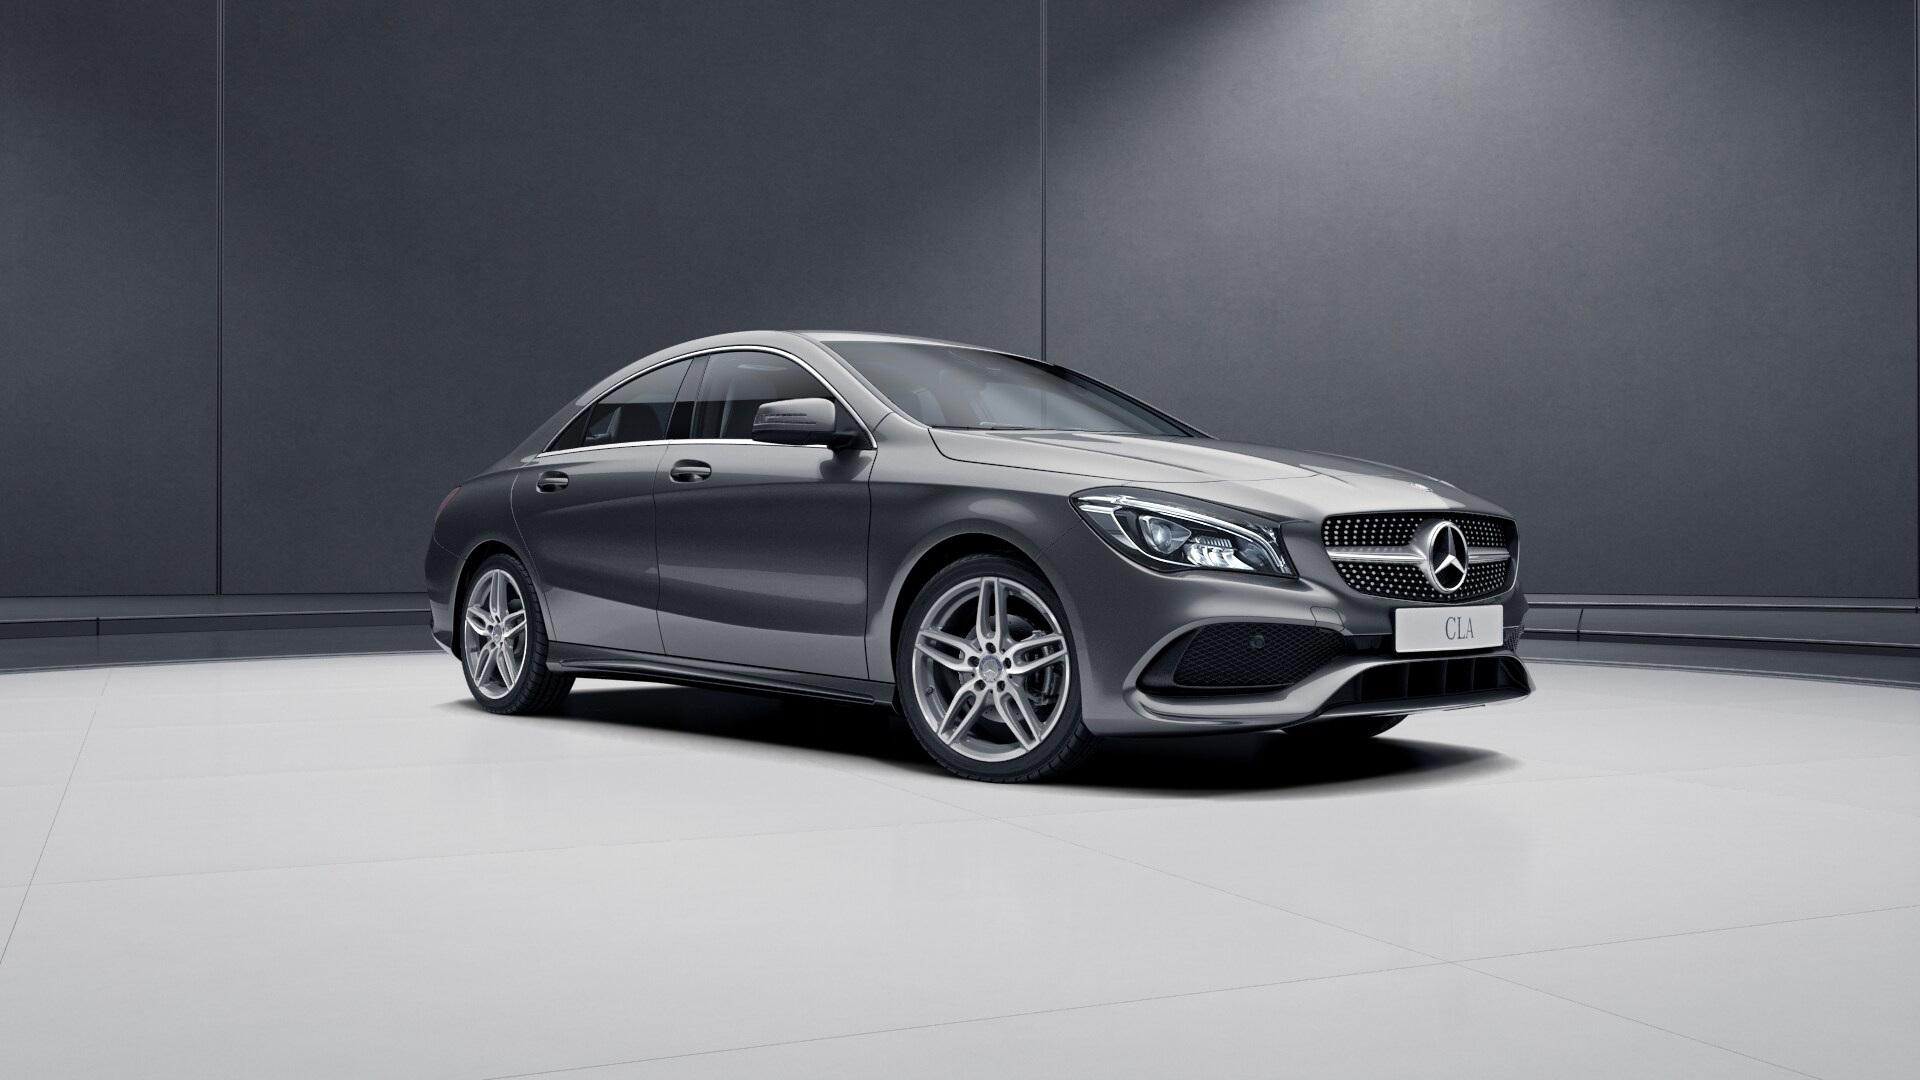 Demo 2017 mercedes benz cla cla45 amg coupe 178128 for Mercedes benz cla45 amg price